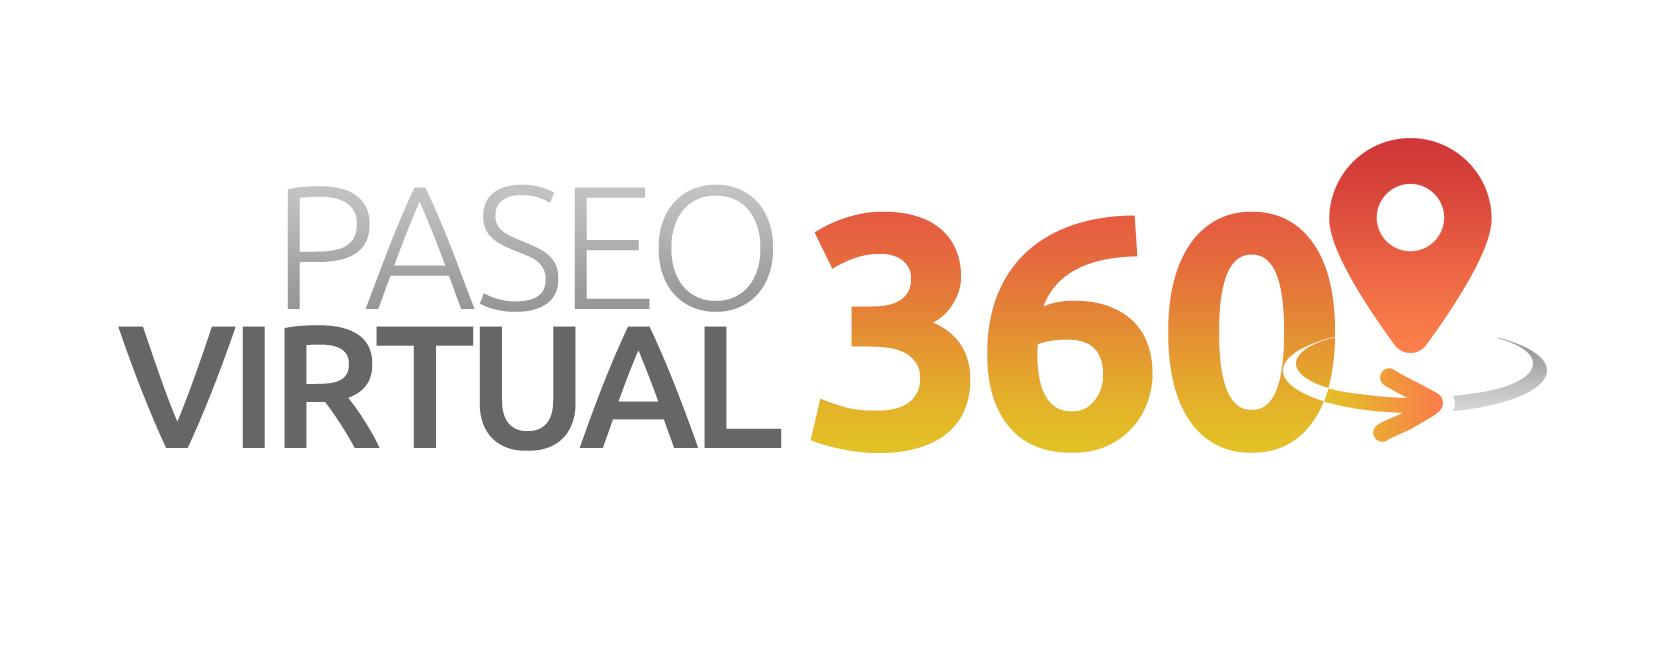 Paseo Virtual 360